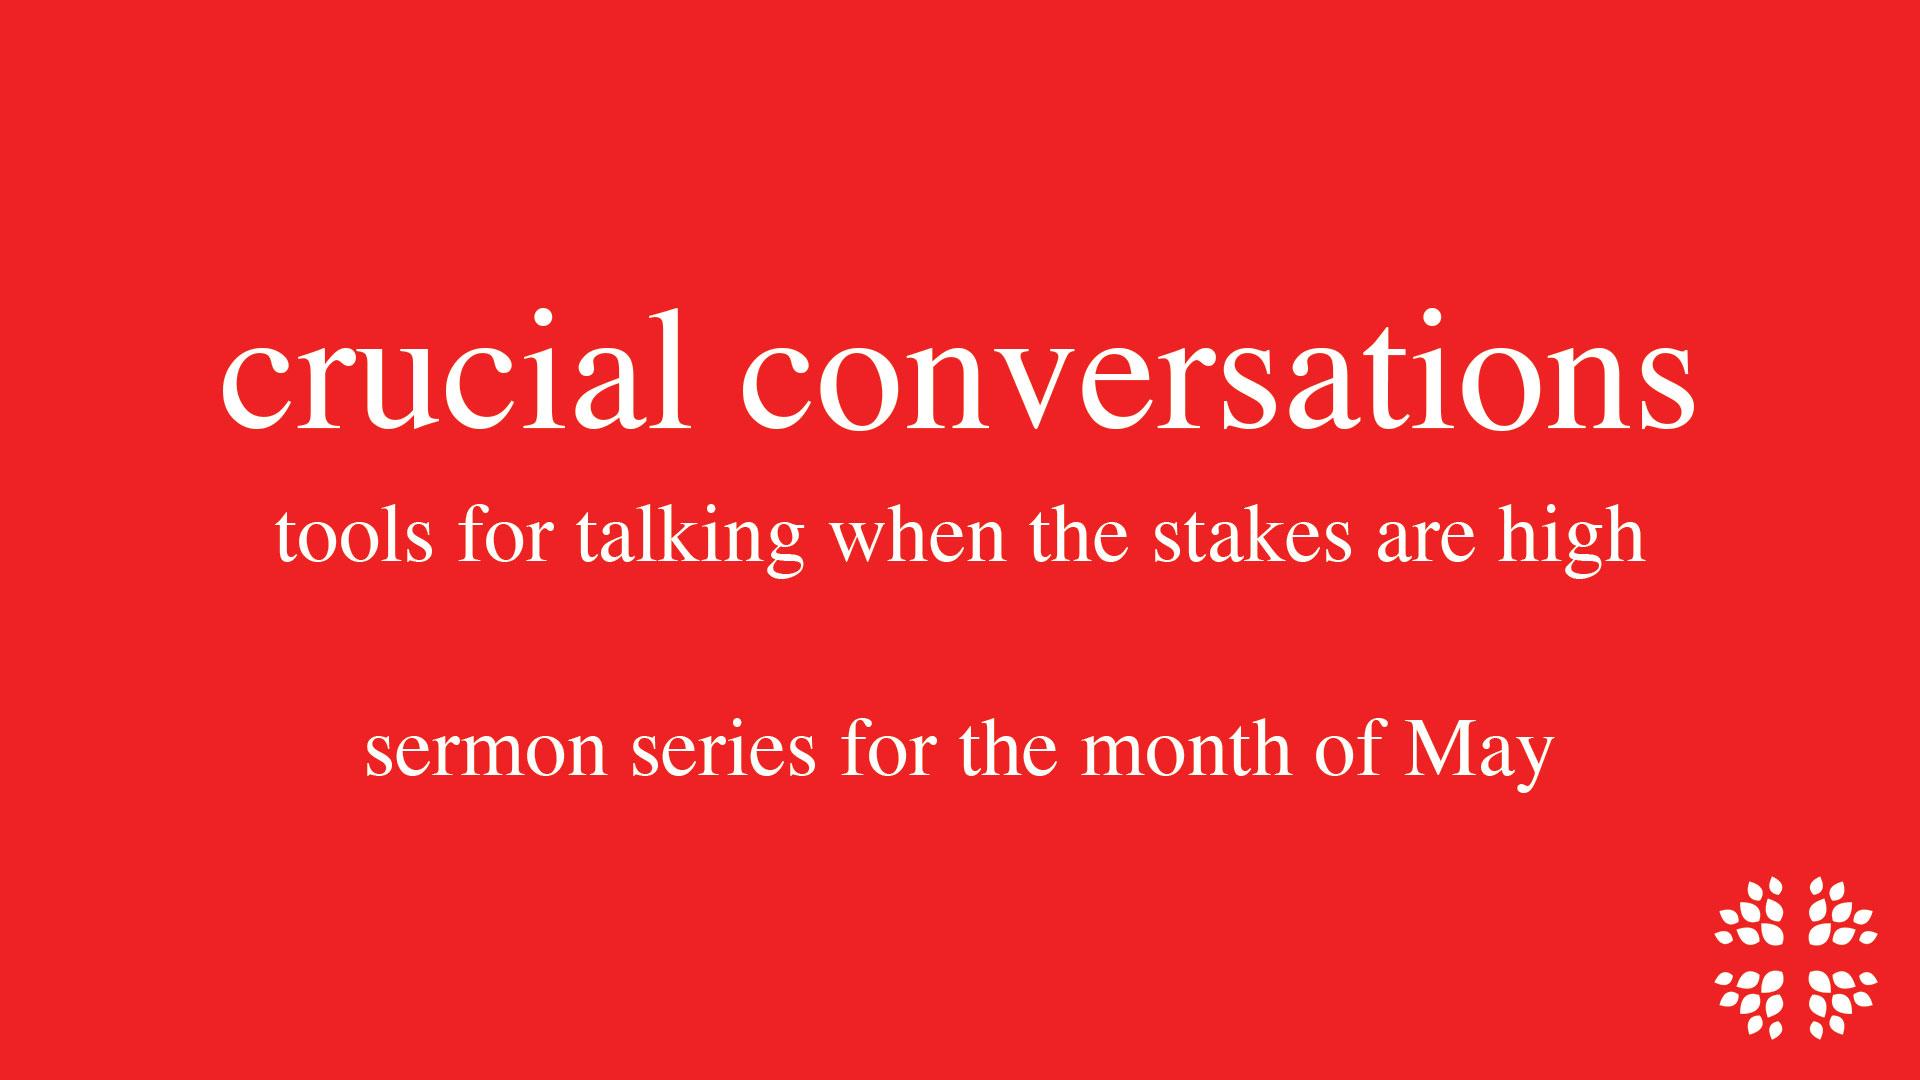 crucial-conversations-slide.jpg